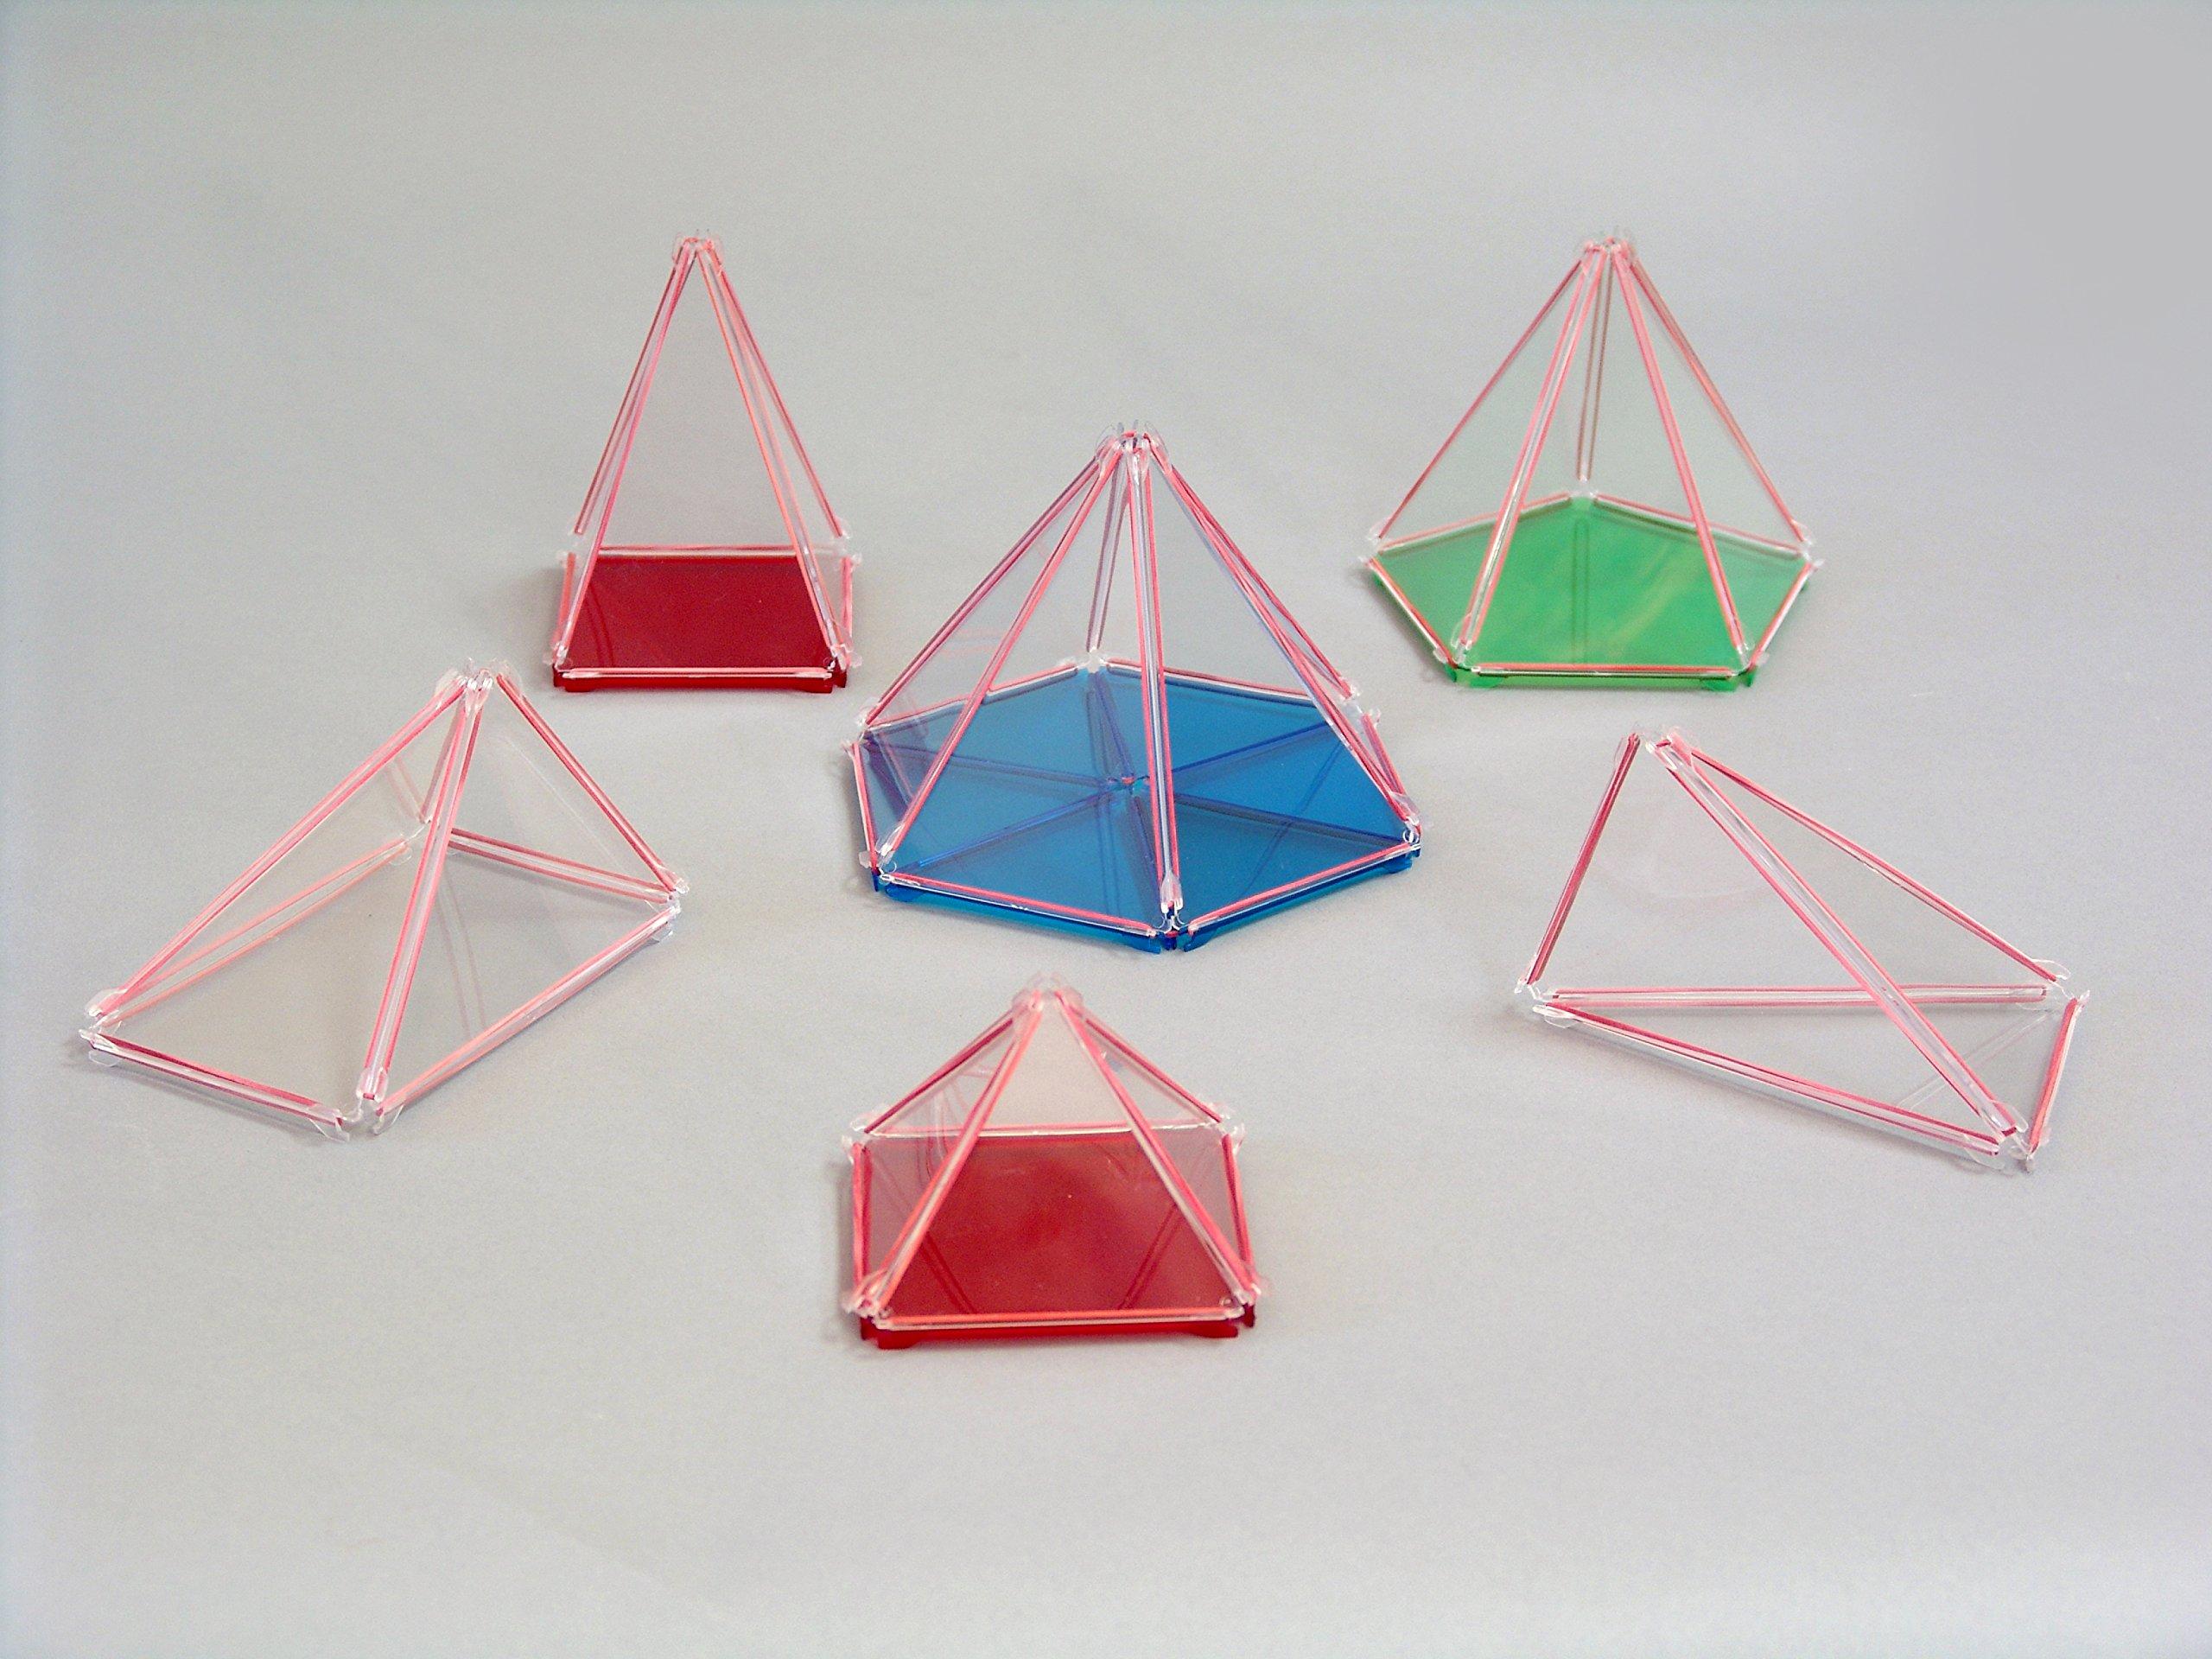 Effect system pyramid set by GH Günter Herrmann